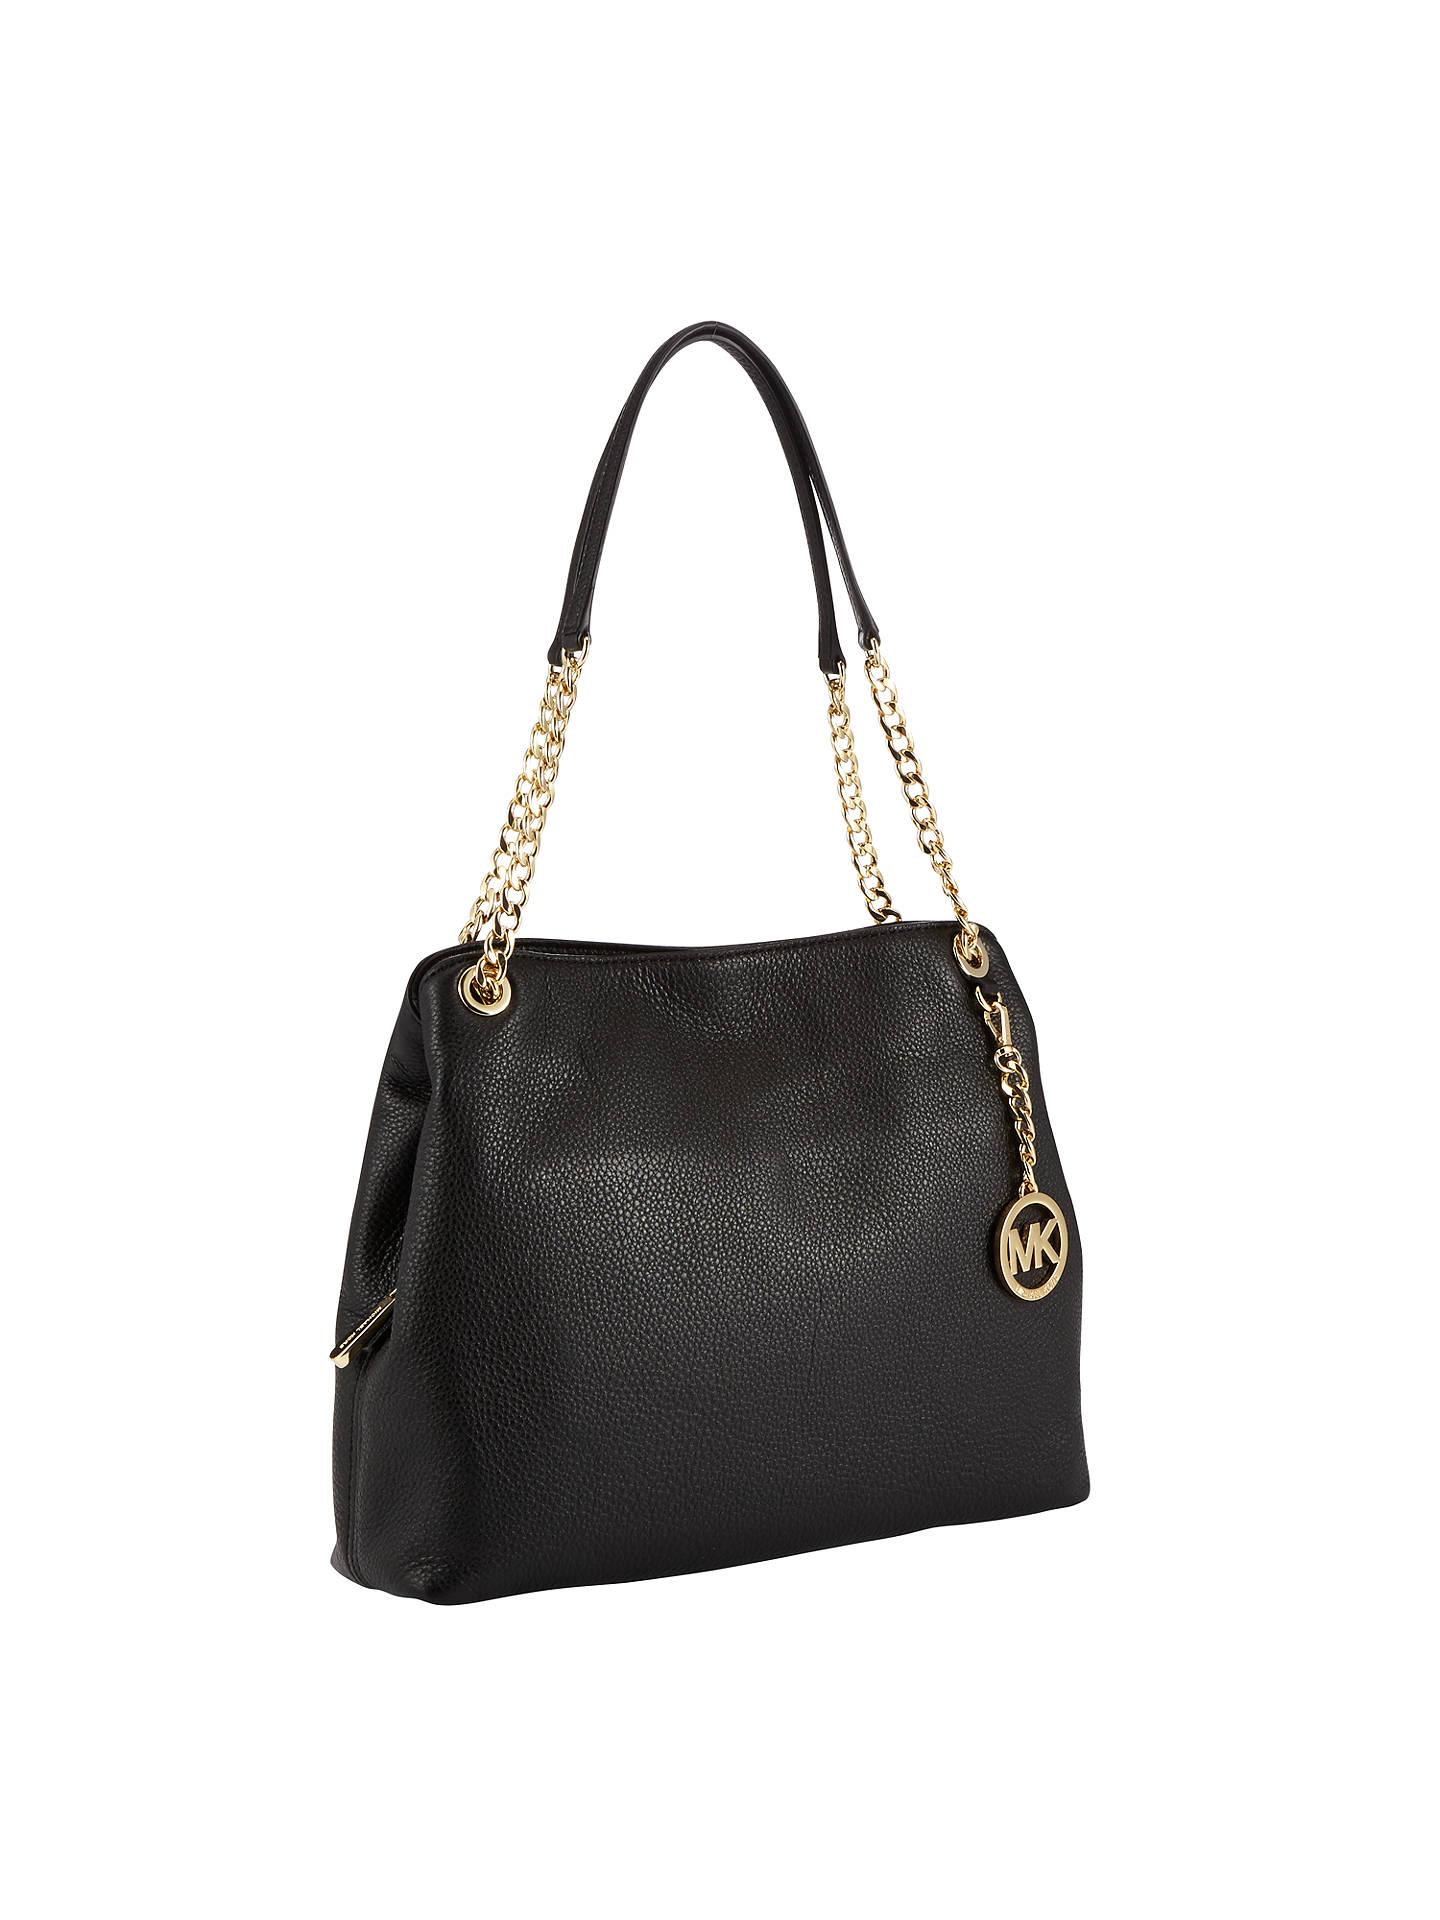 1a17e6dc87f4 ... Buy MICHAEL Michael Kors Jet Set Travel Leather Chain Strap Large  Shoulder Bag